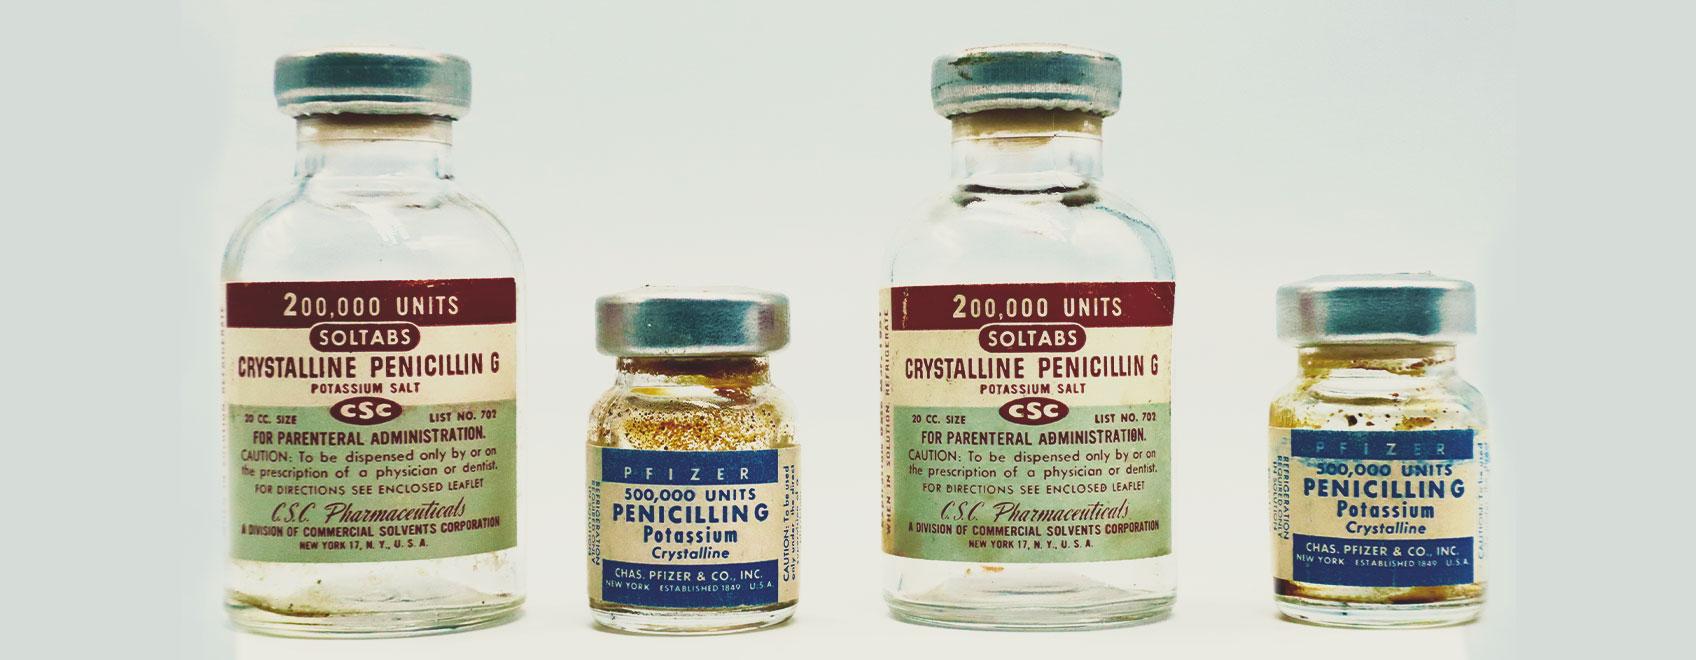 A Brief History of Antibiotics